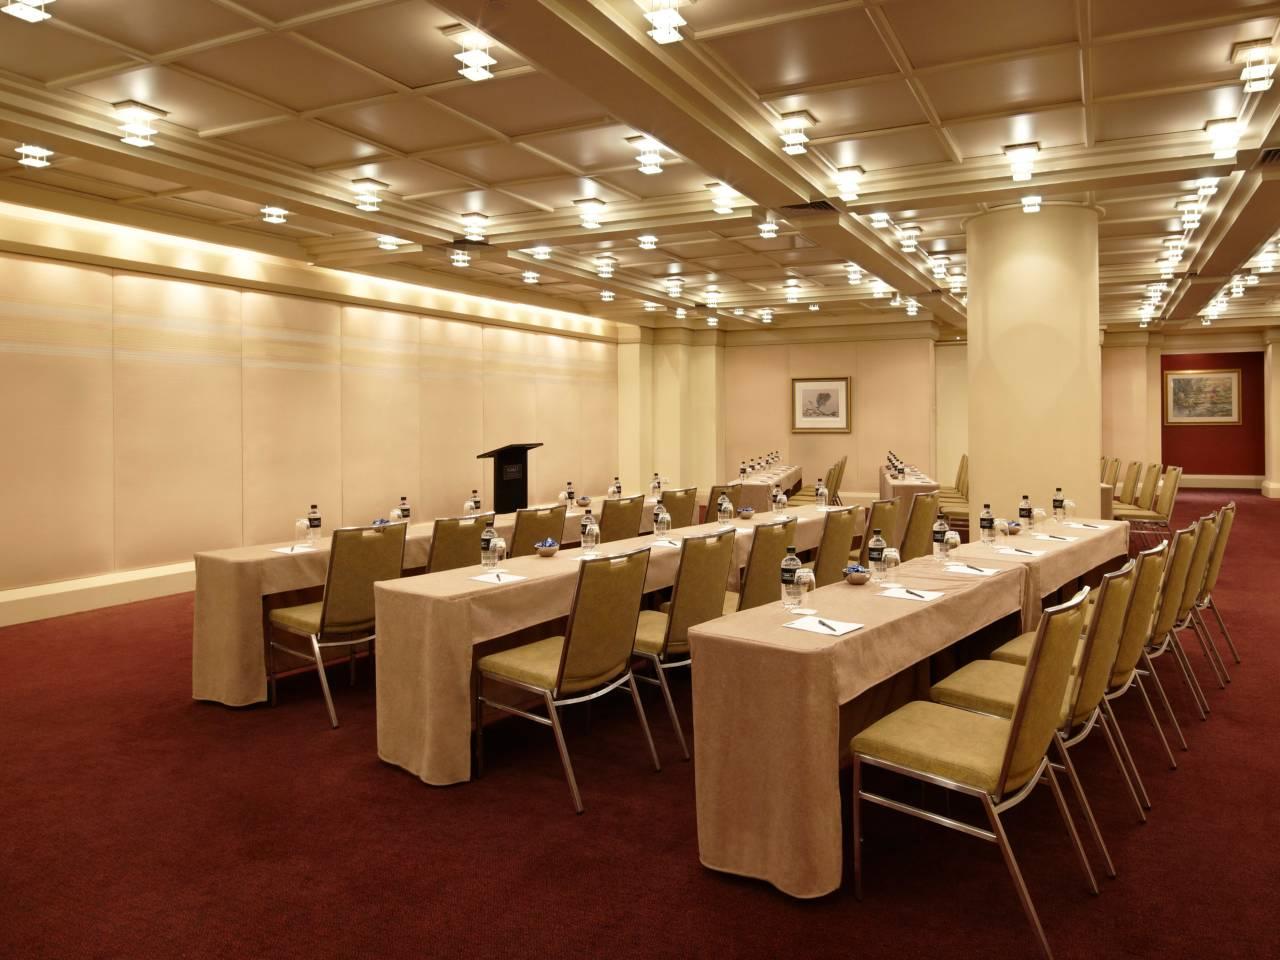 Classroom style venue